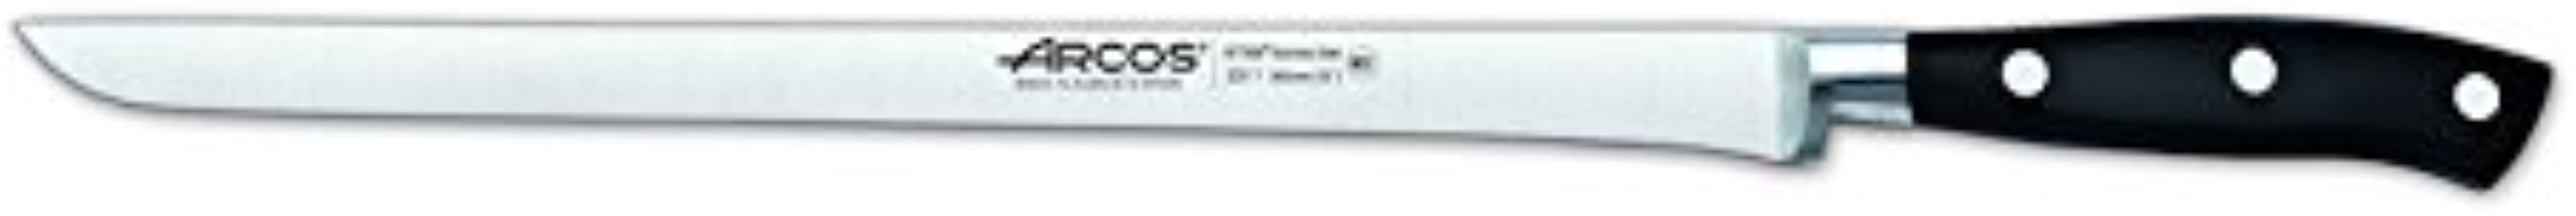 Arcos Forged Riviera 12 Inch 300 Mm Flexible Ham Knife